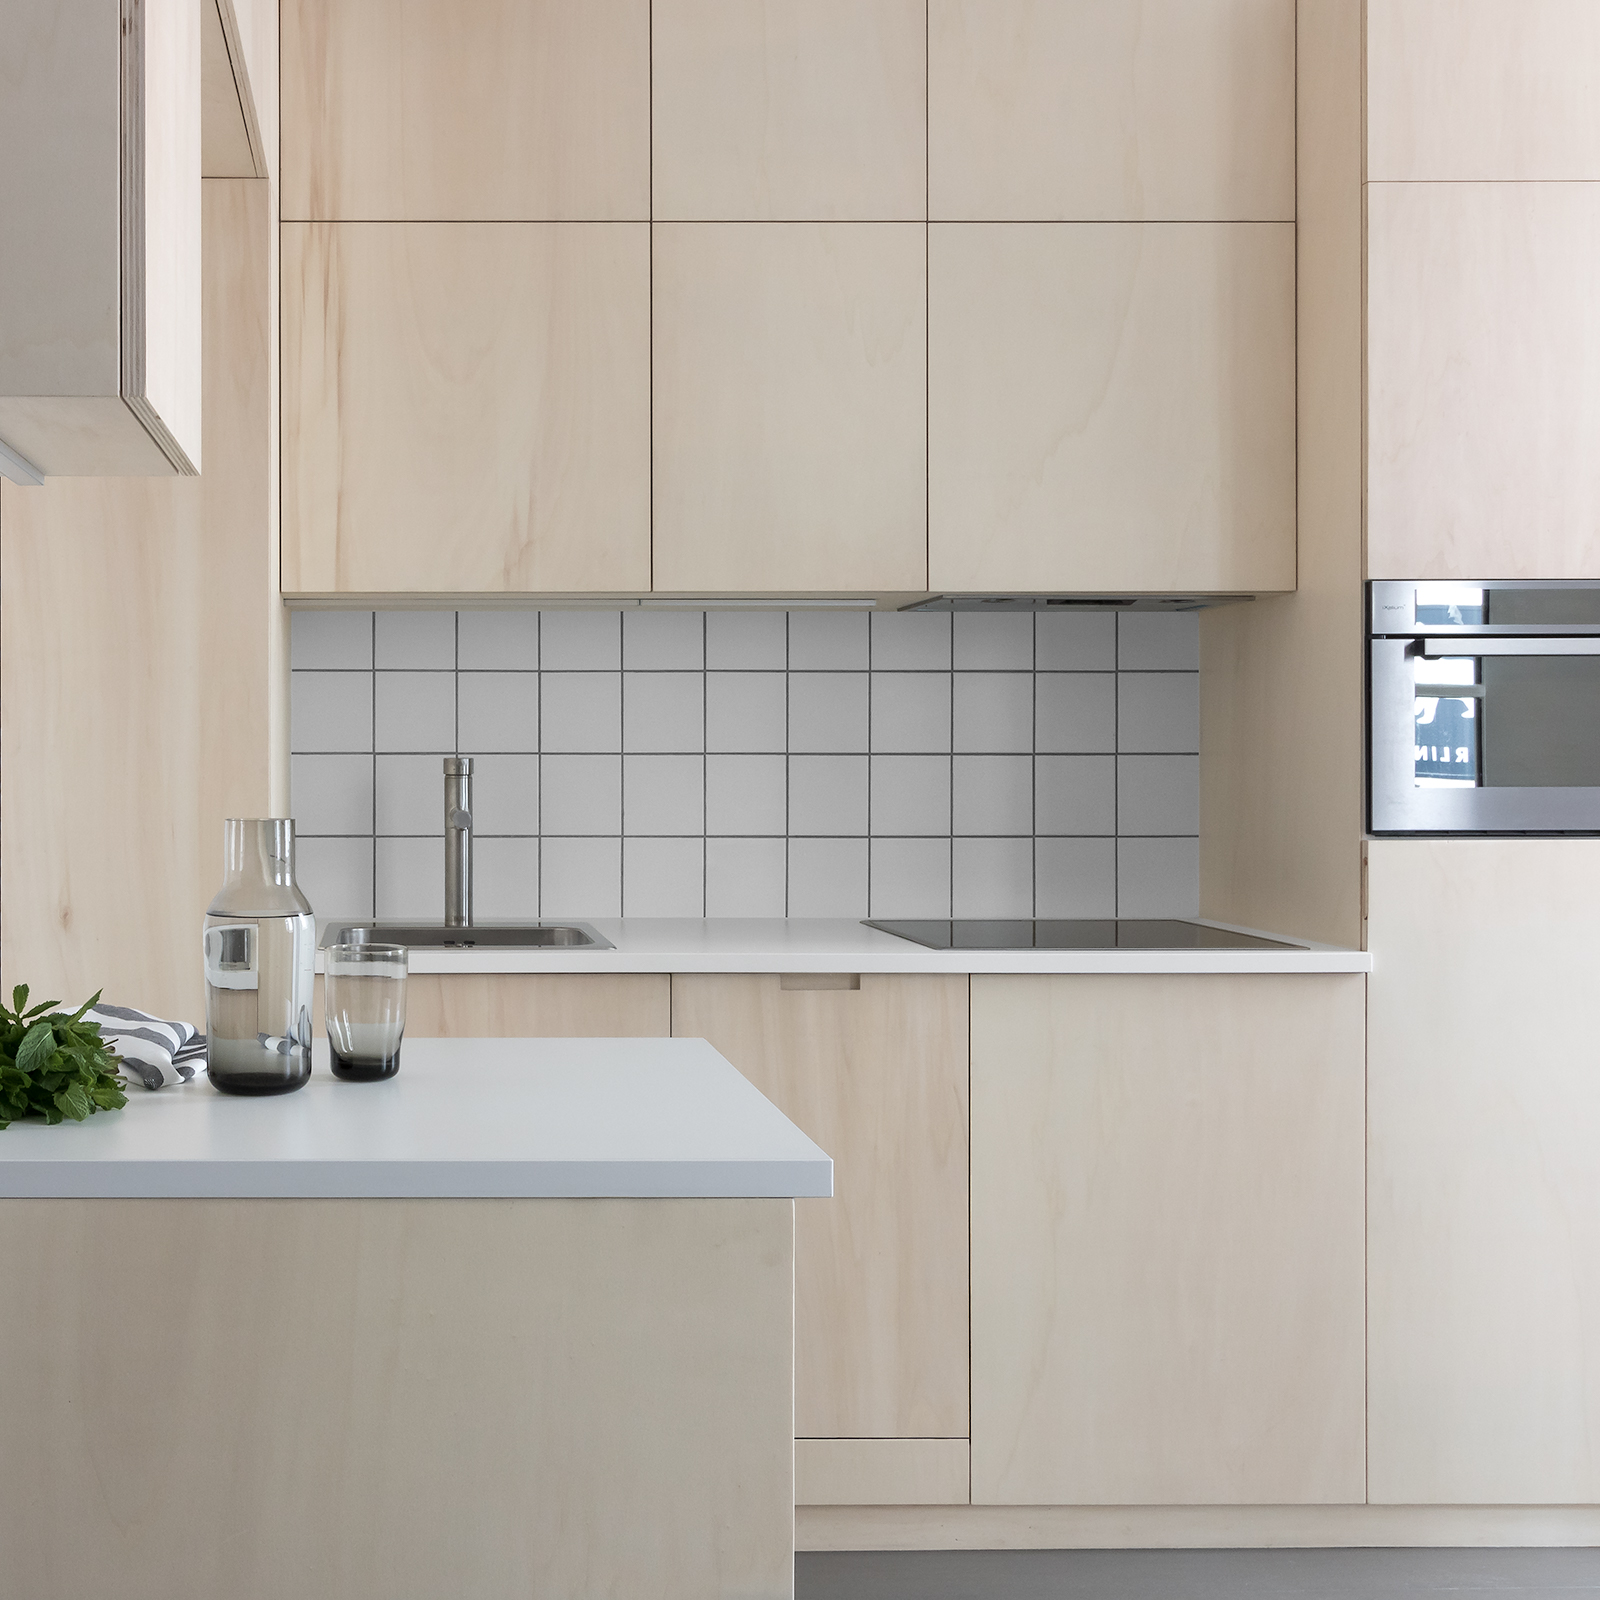 minimal modern Japanese plywood kitchen